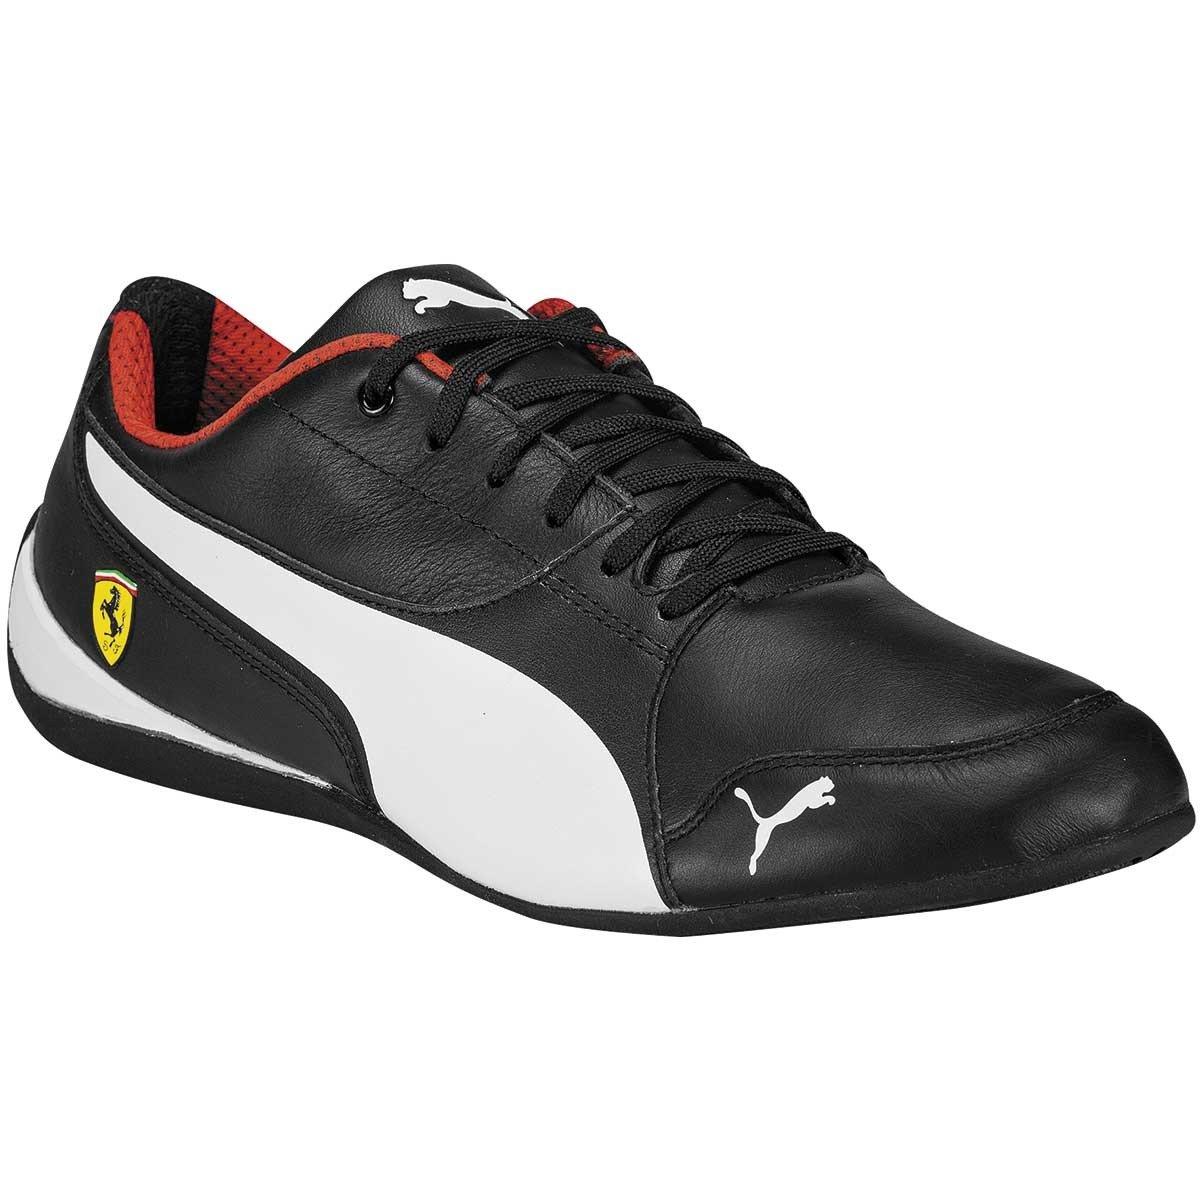 484c91535909c Buty Puma Ferrari Drift Cat 7 - 305998-02 - Basketo.pl